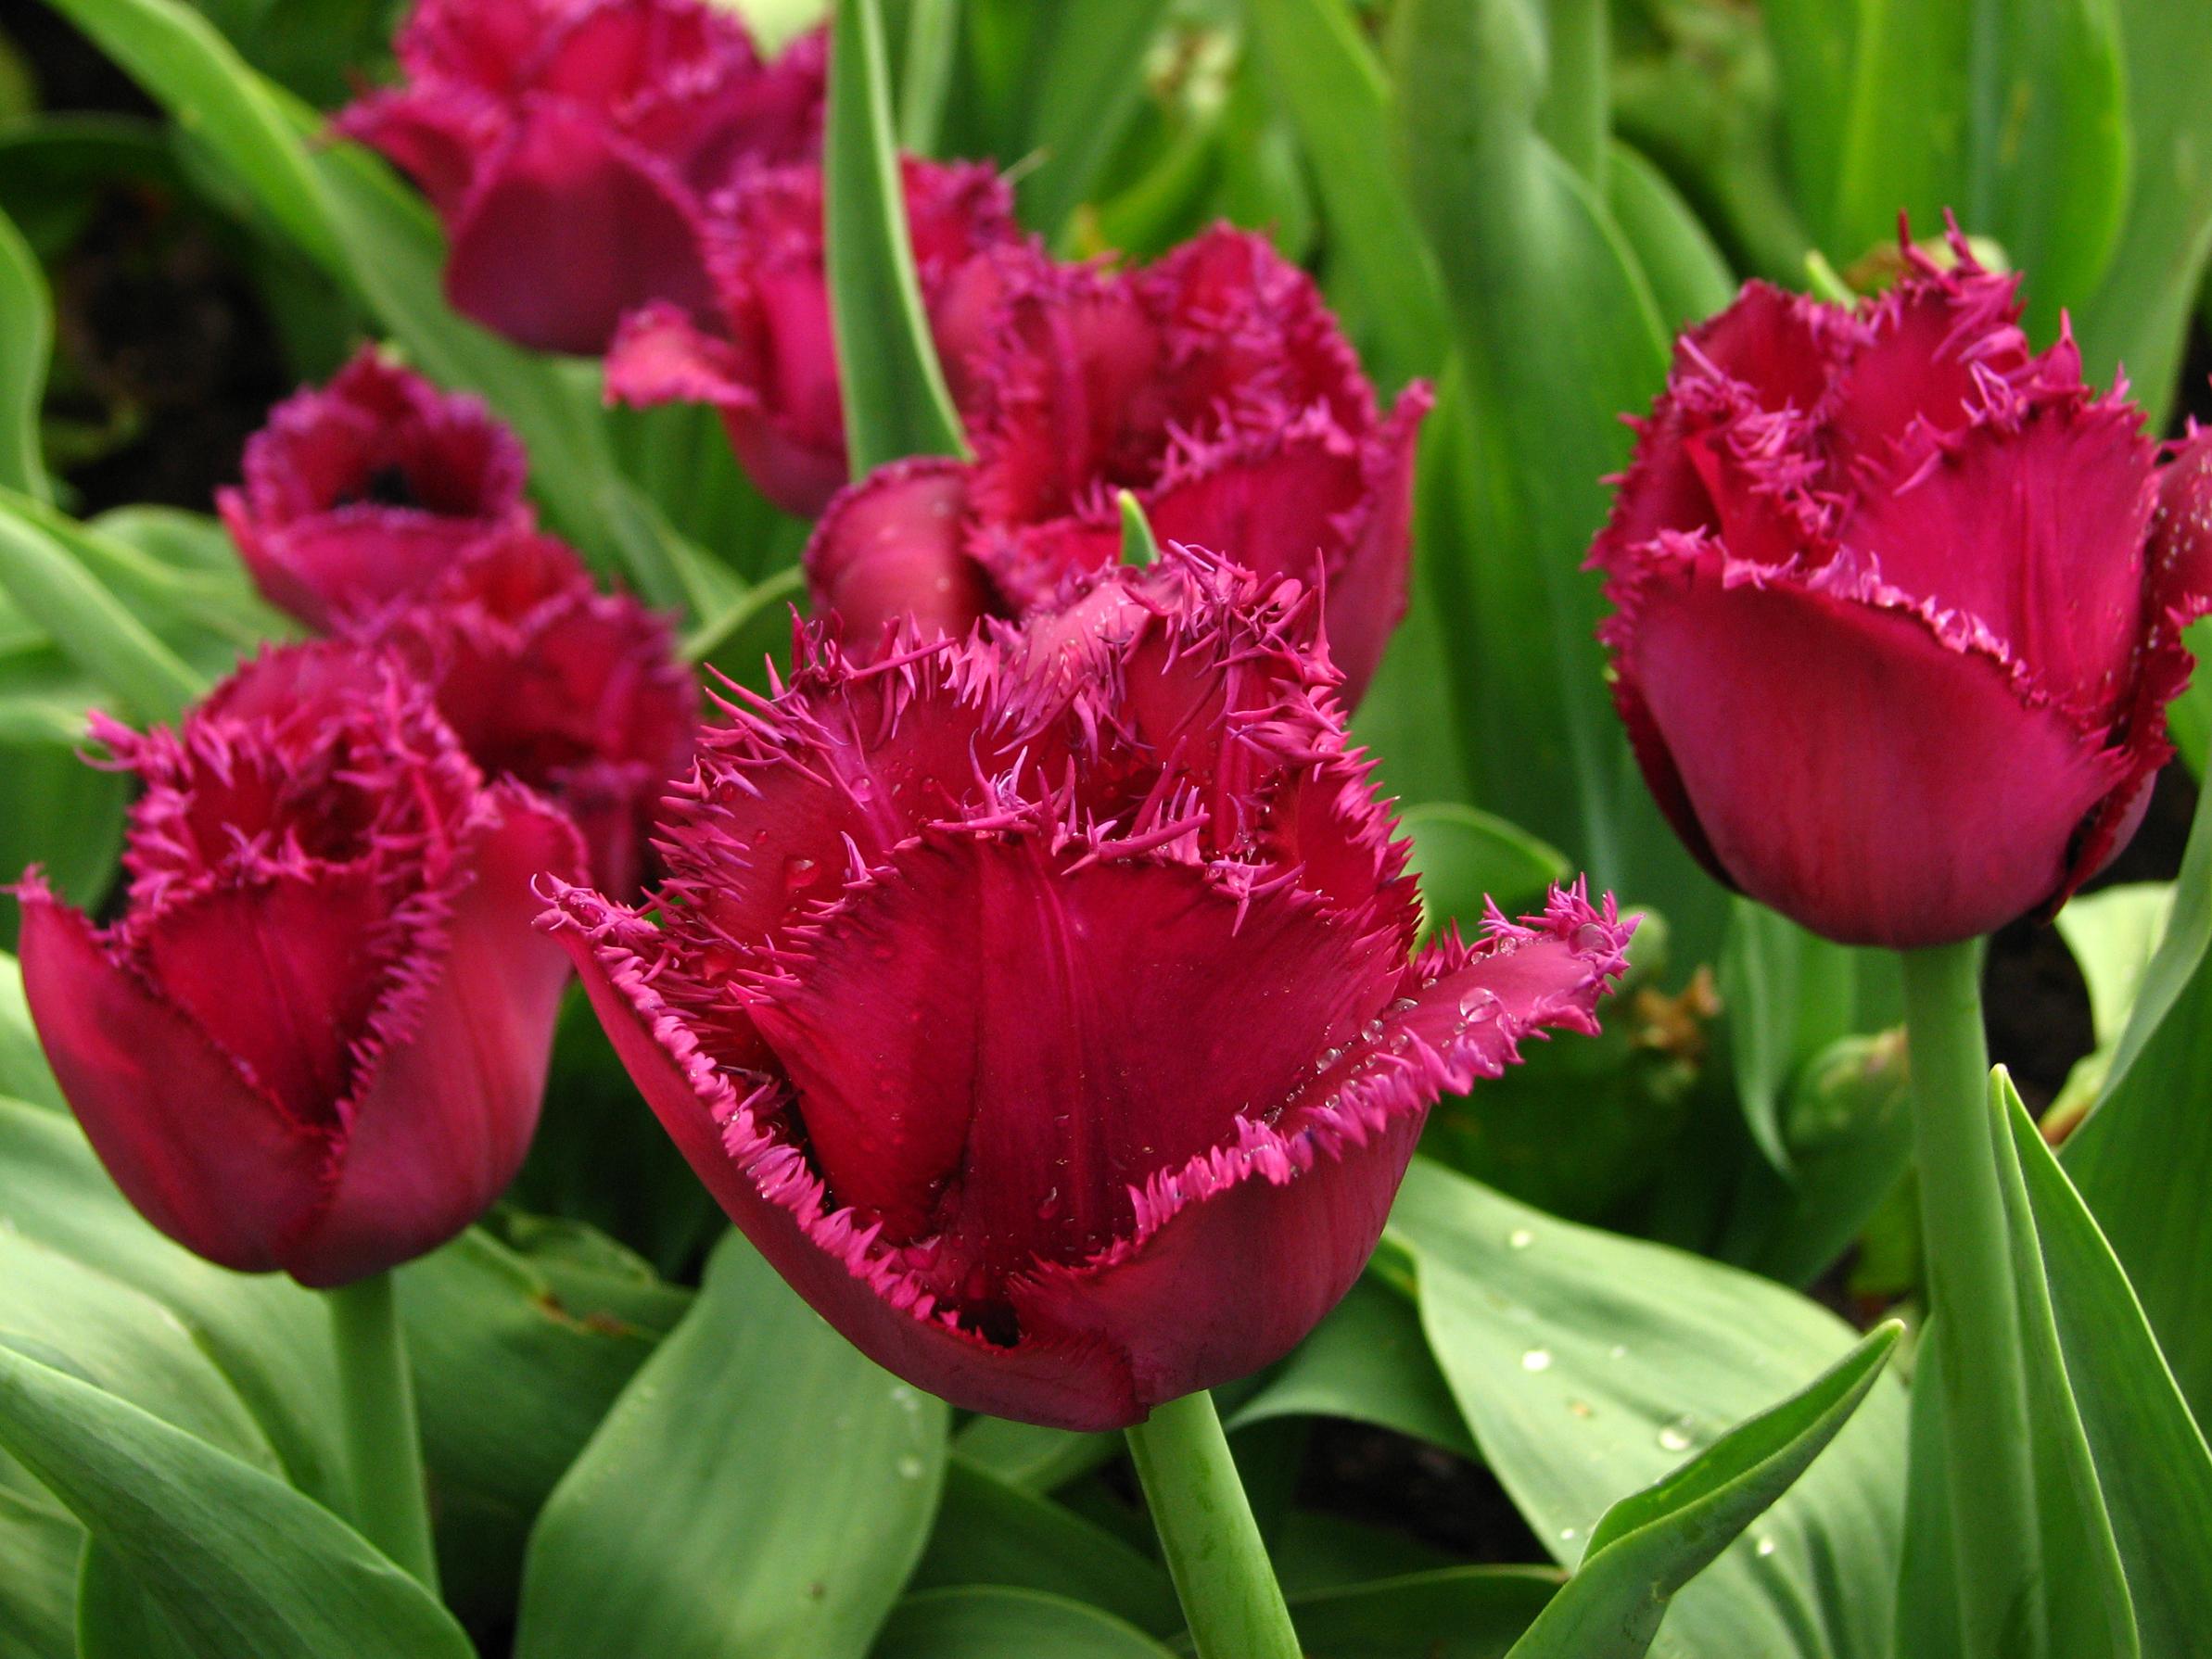 https://s1.1zoom.ru/big3/203/Tulips_Closeup_Wine_color_529908_2386x1790.jpg